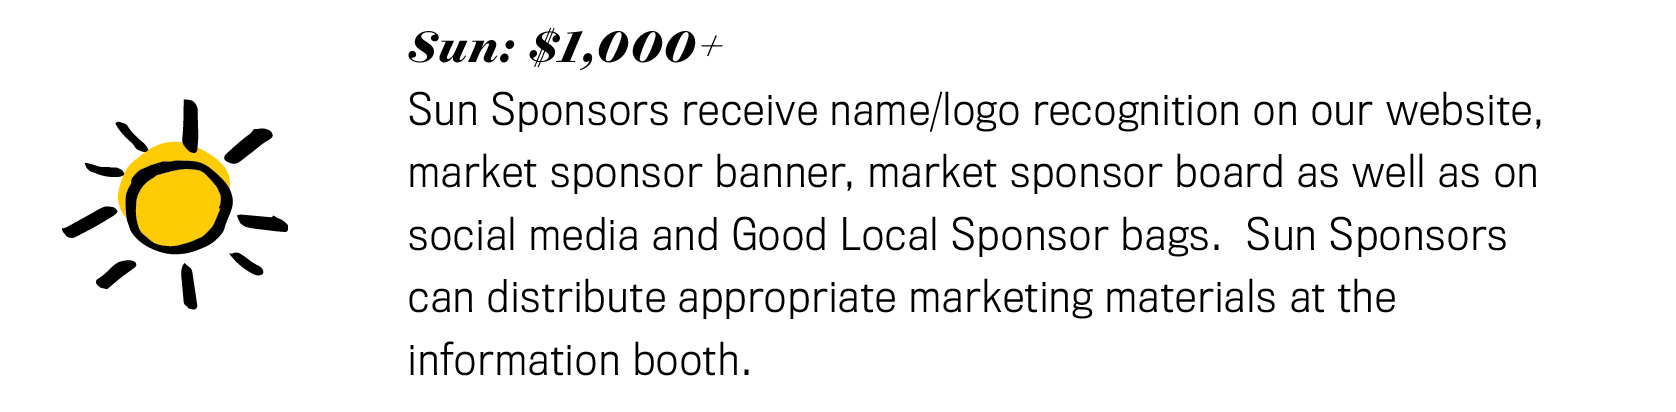 GLM-SponsorPacket-Level-3.jpg